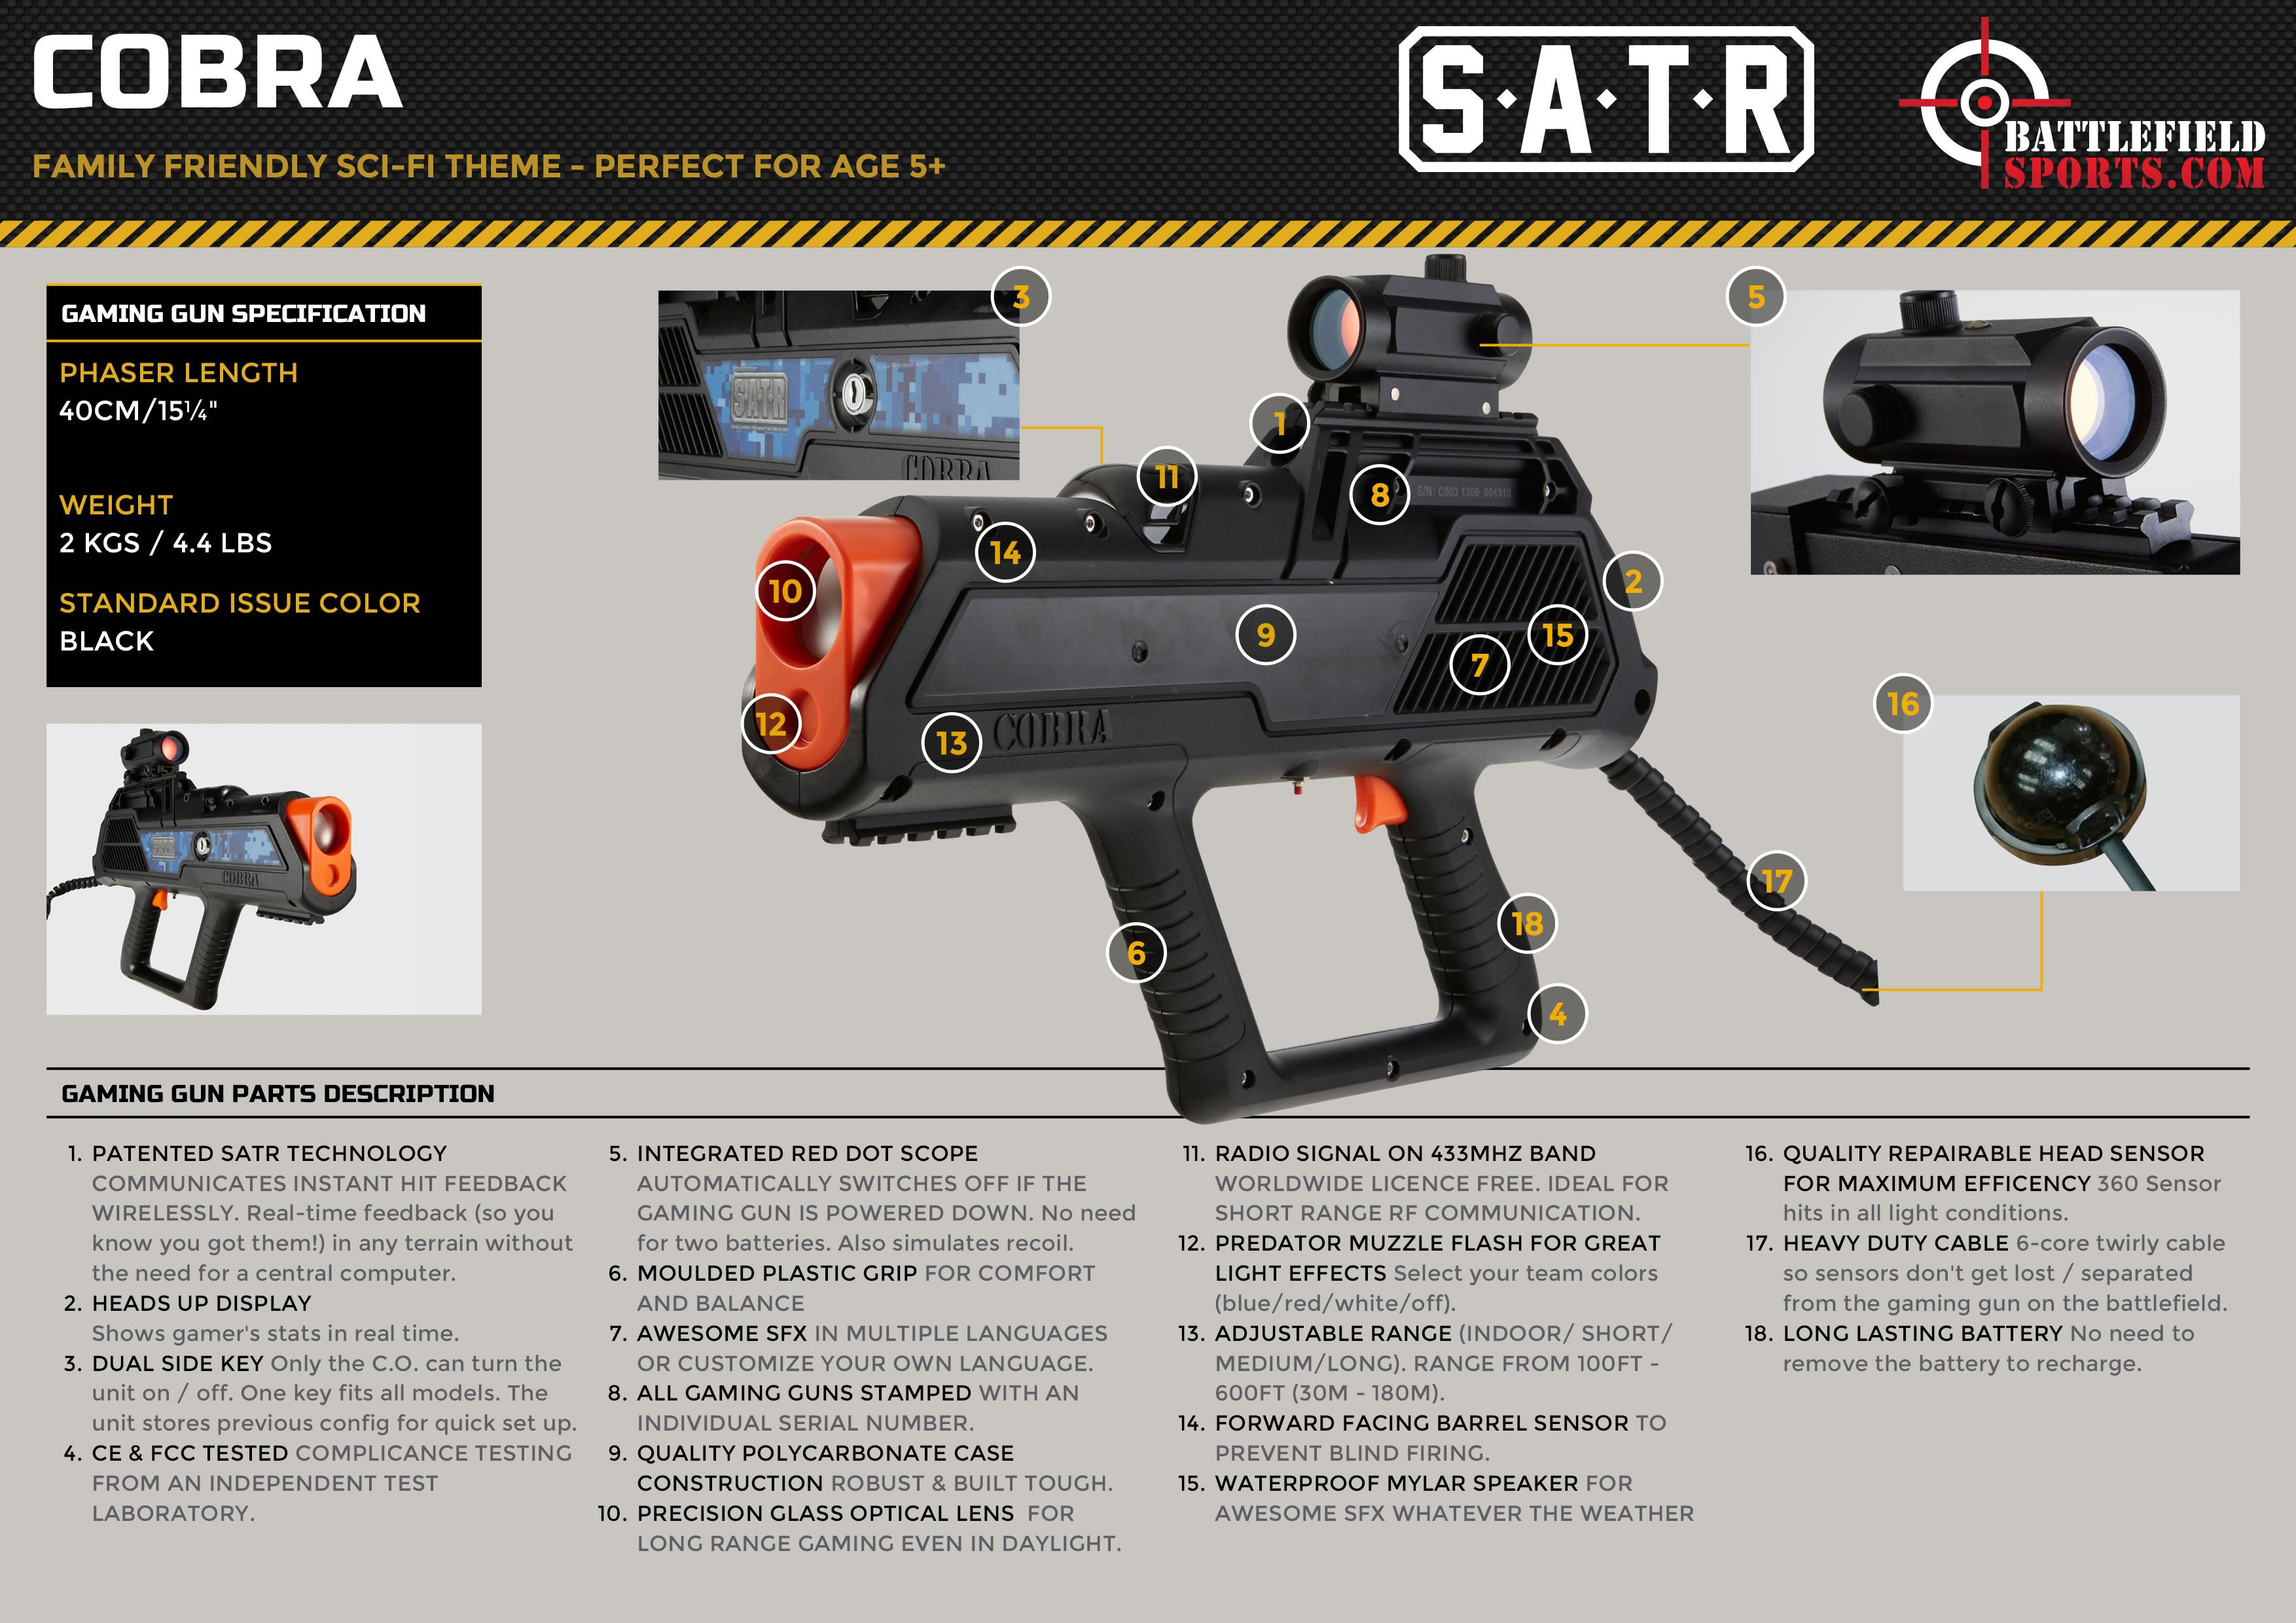 Best Seller 🔥 Cobra Laser Tag Gun From Battlefield Sports